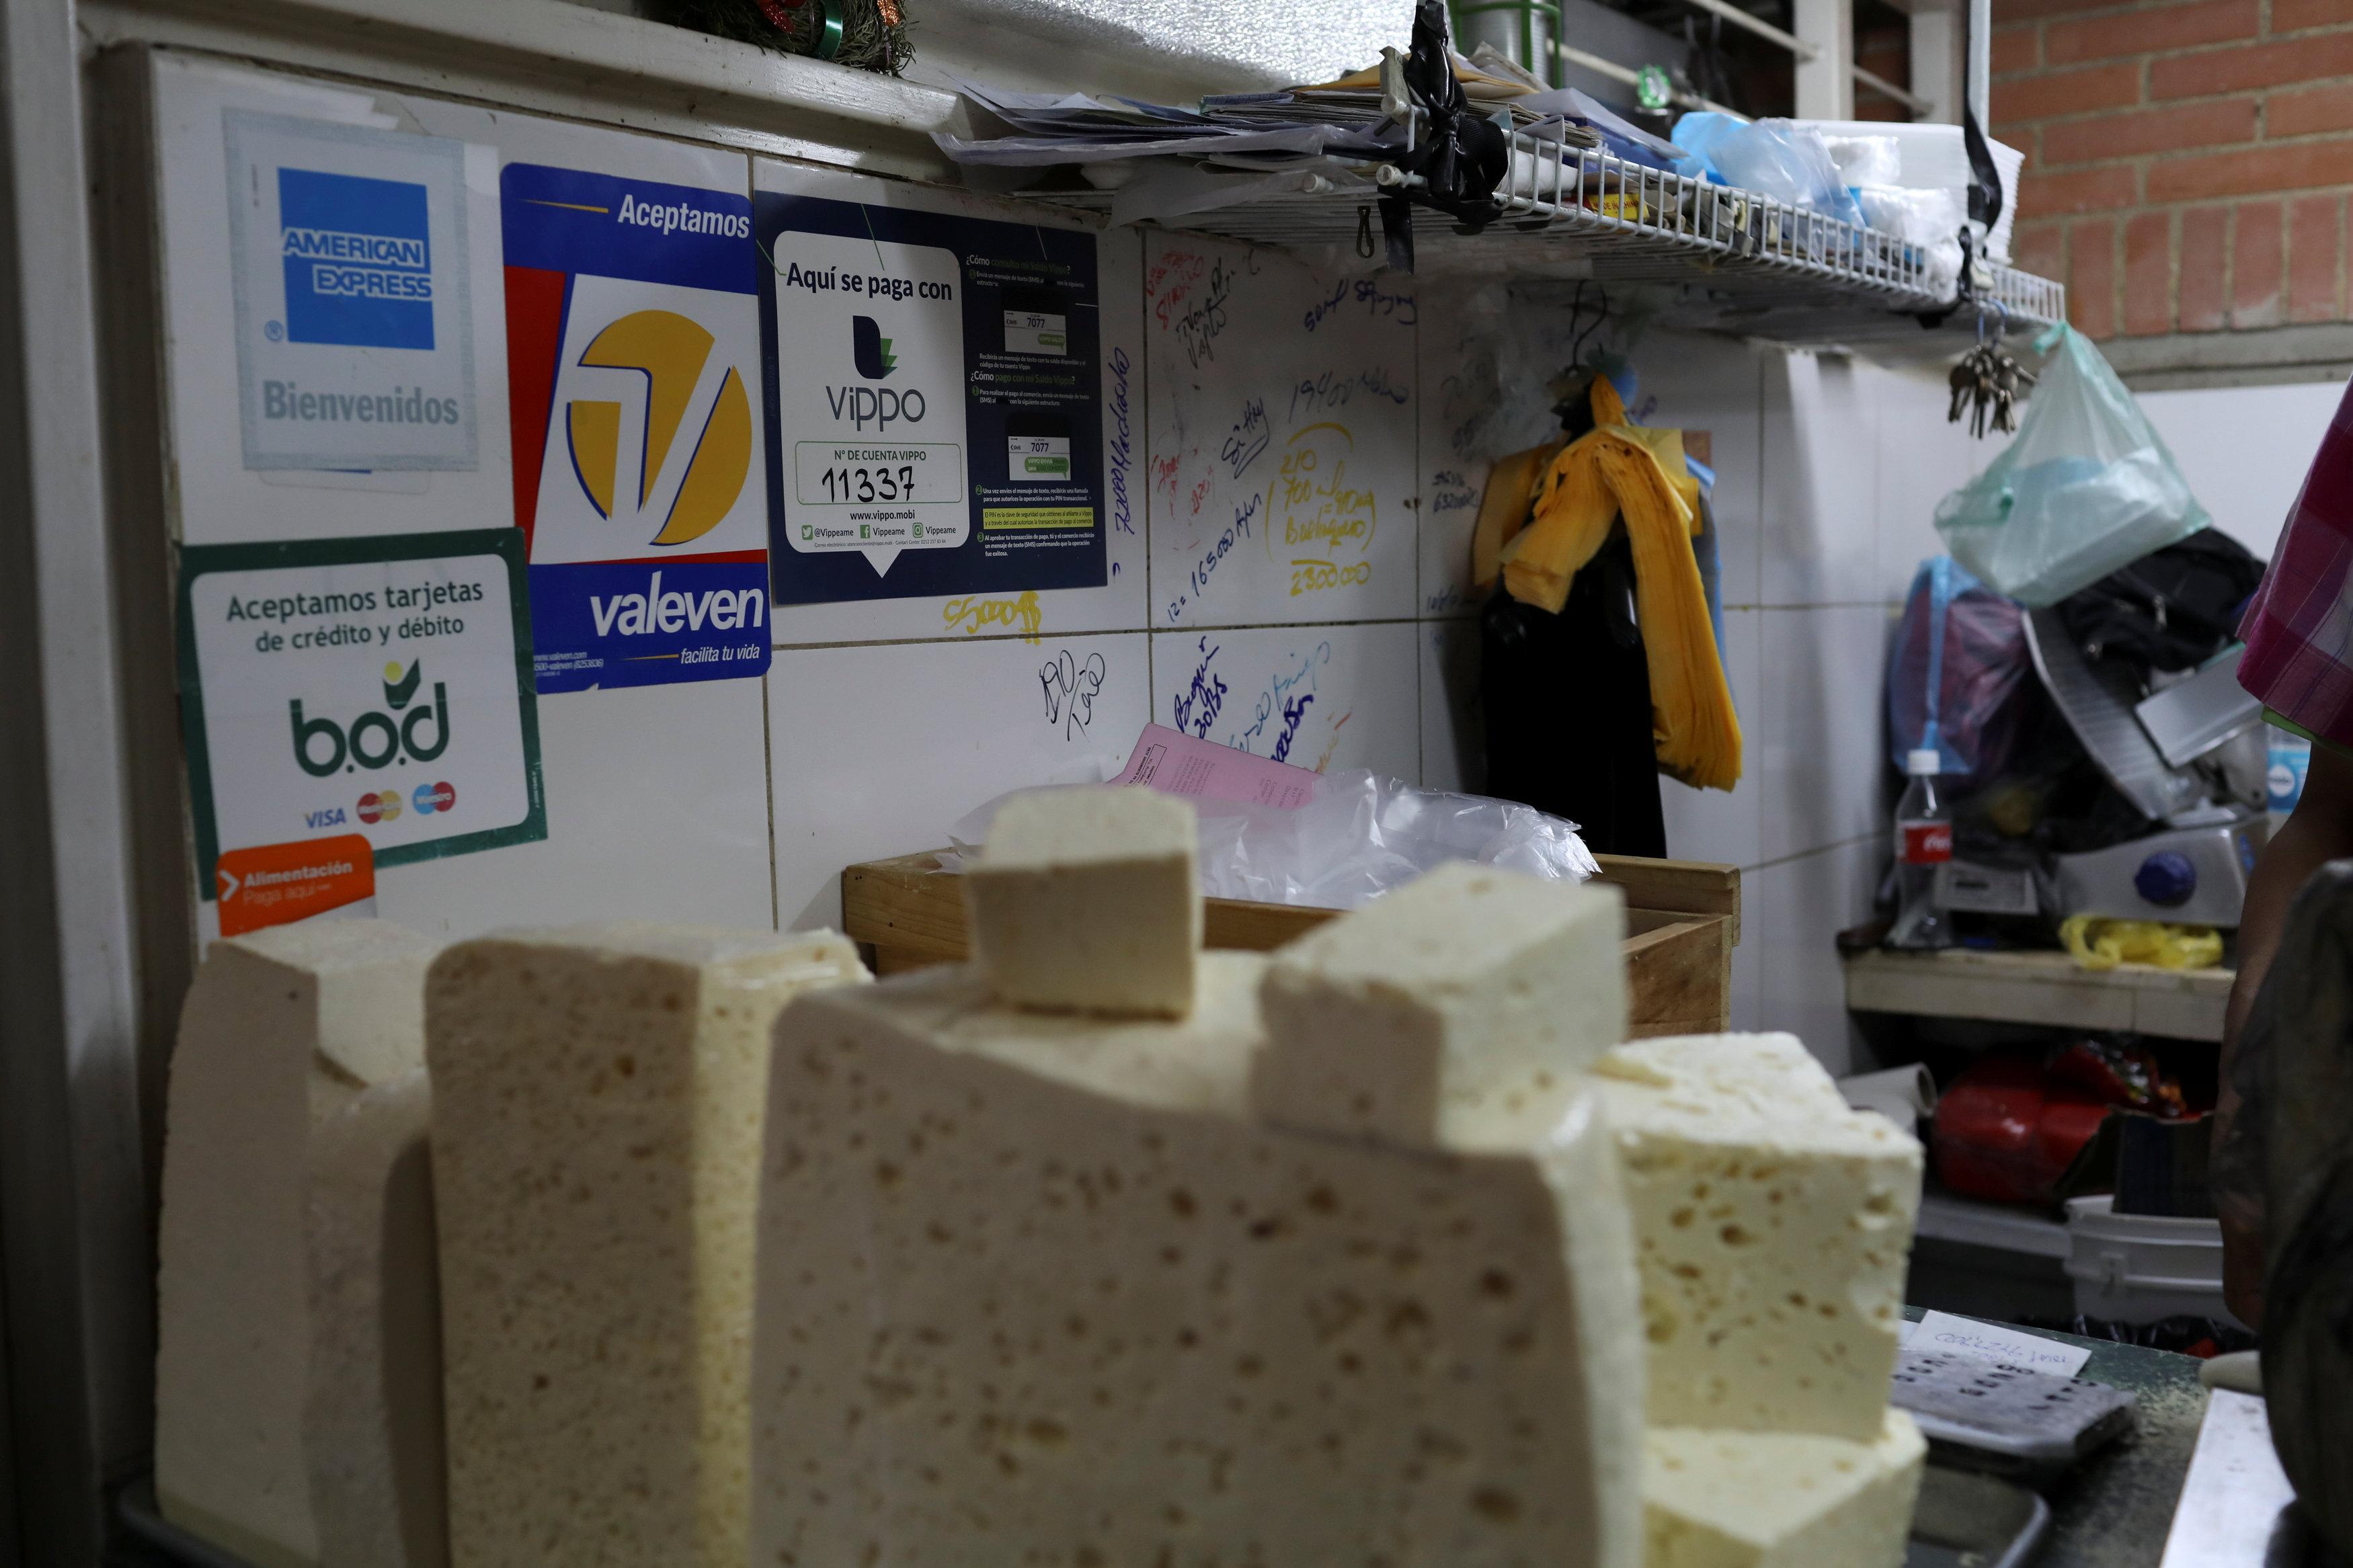 Hyperinflation meets tech: Cash-scarce Venezuela sees boom